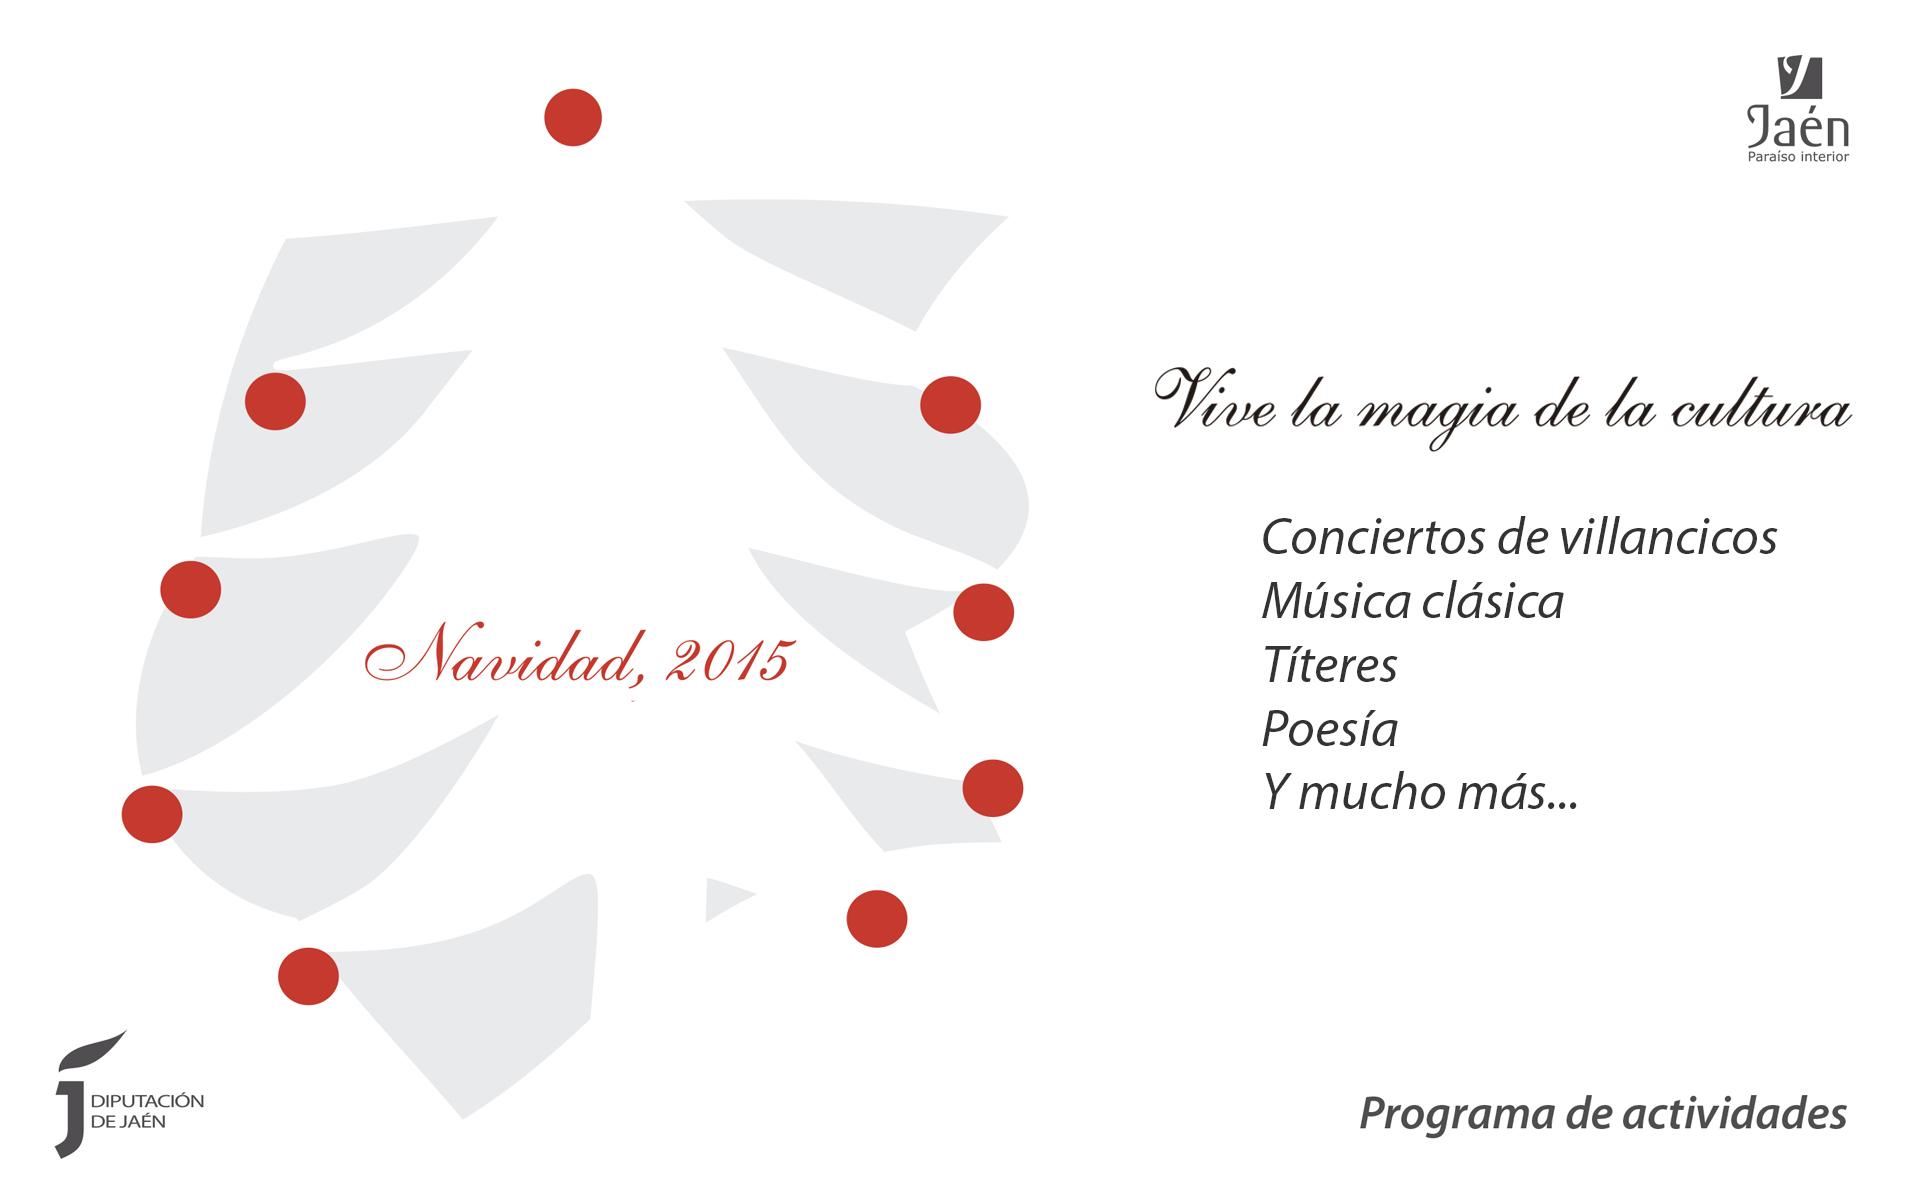 http://www.dipujaen.es/navidad